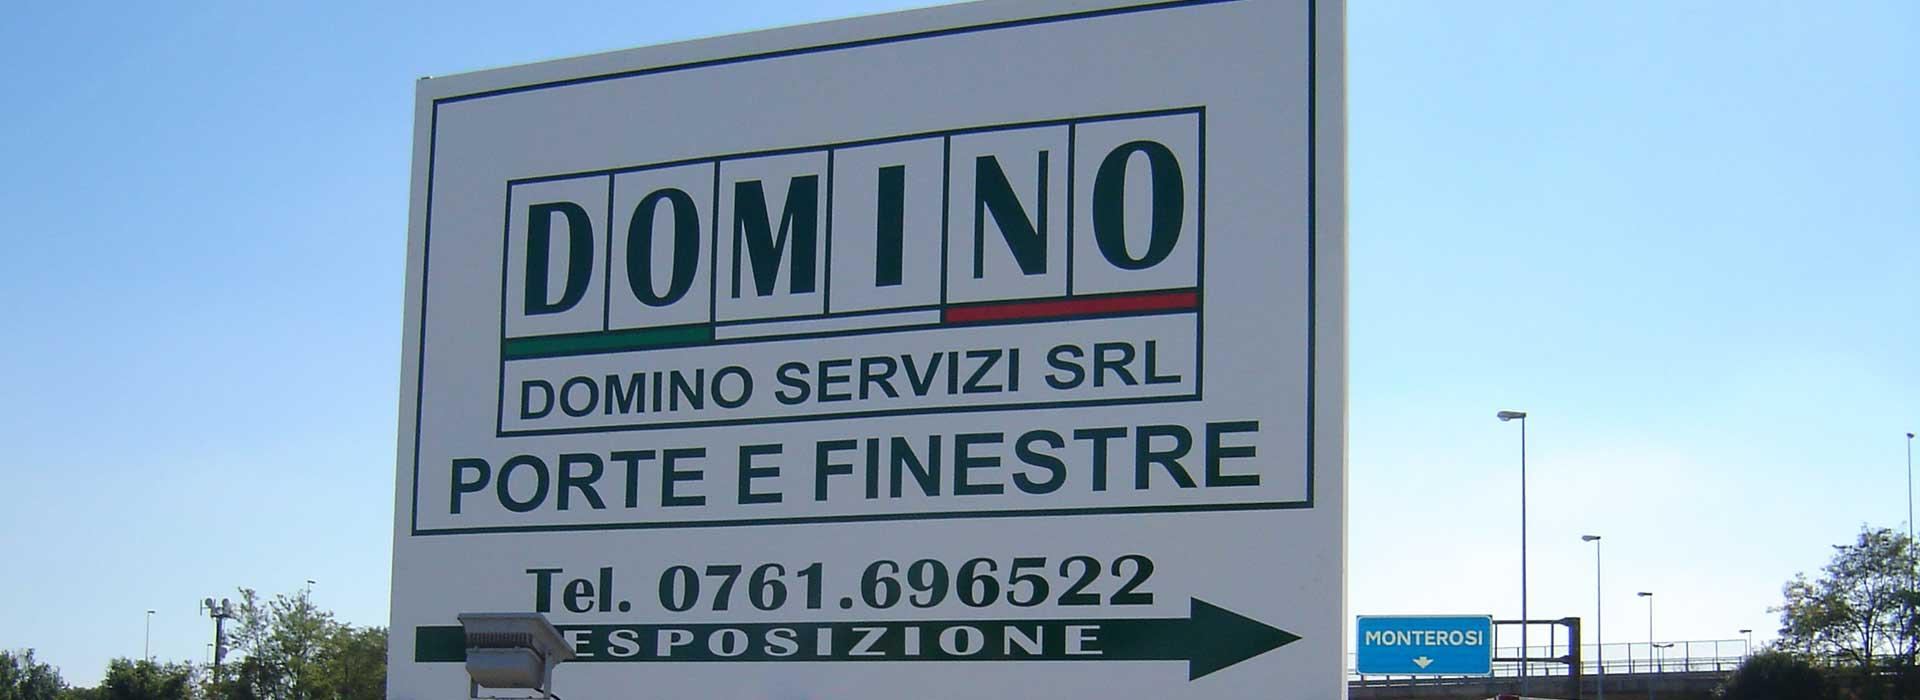 Domino Servizi Viterbo